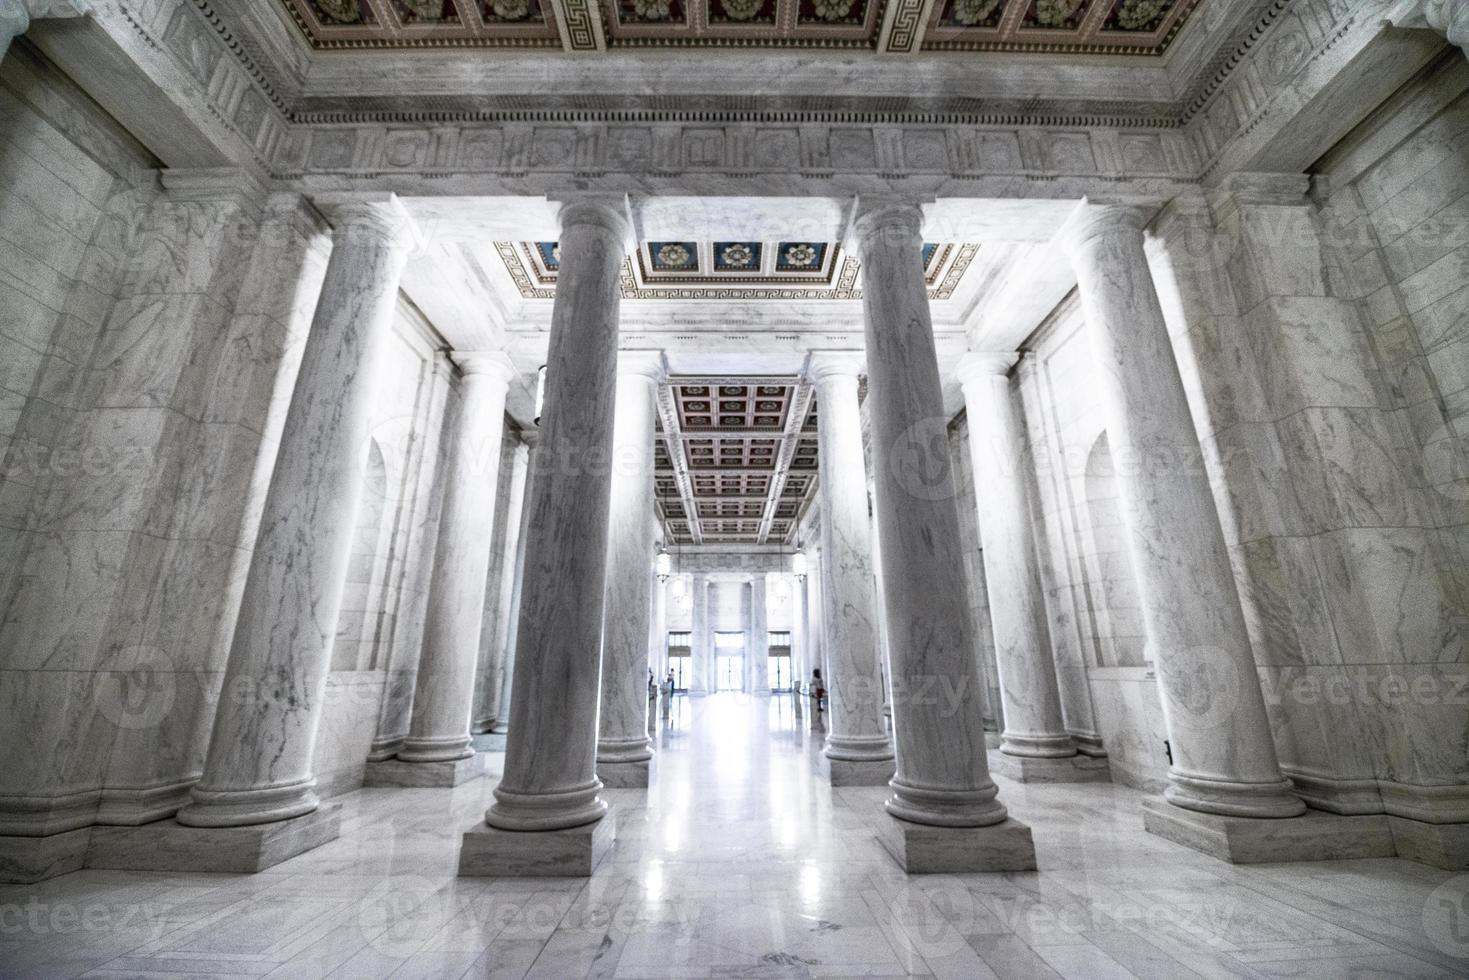 Oberster Gerichtshof der Vereinigten Staaten foto